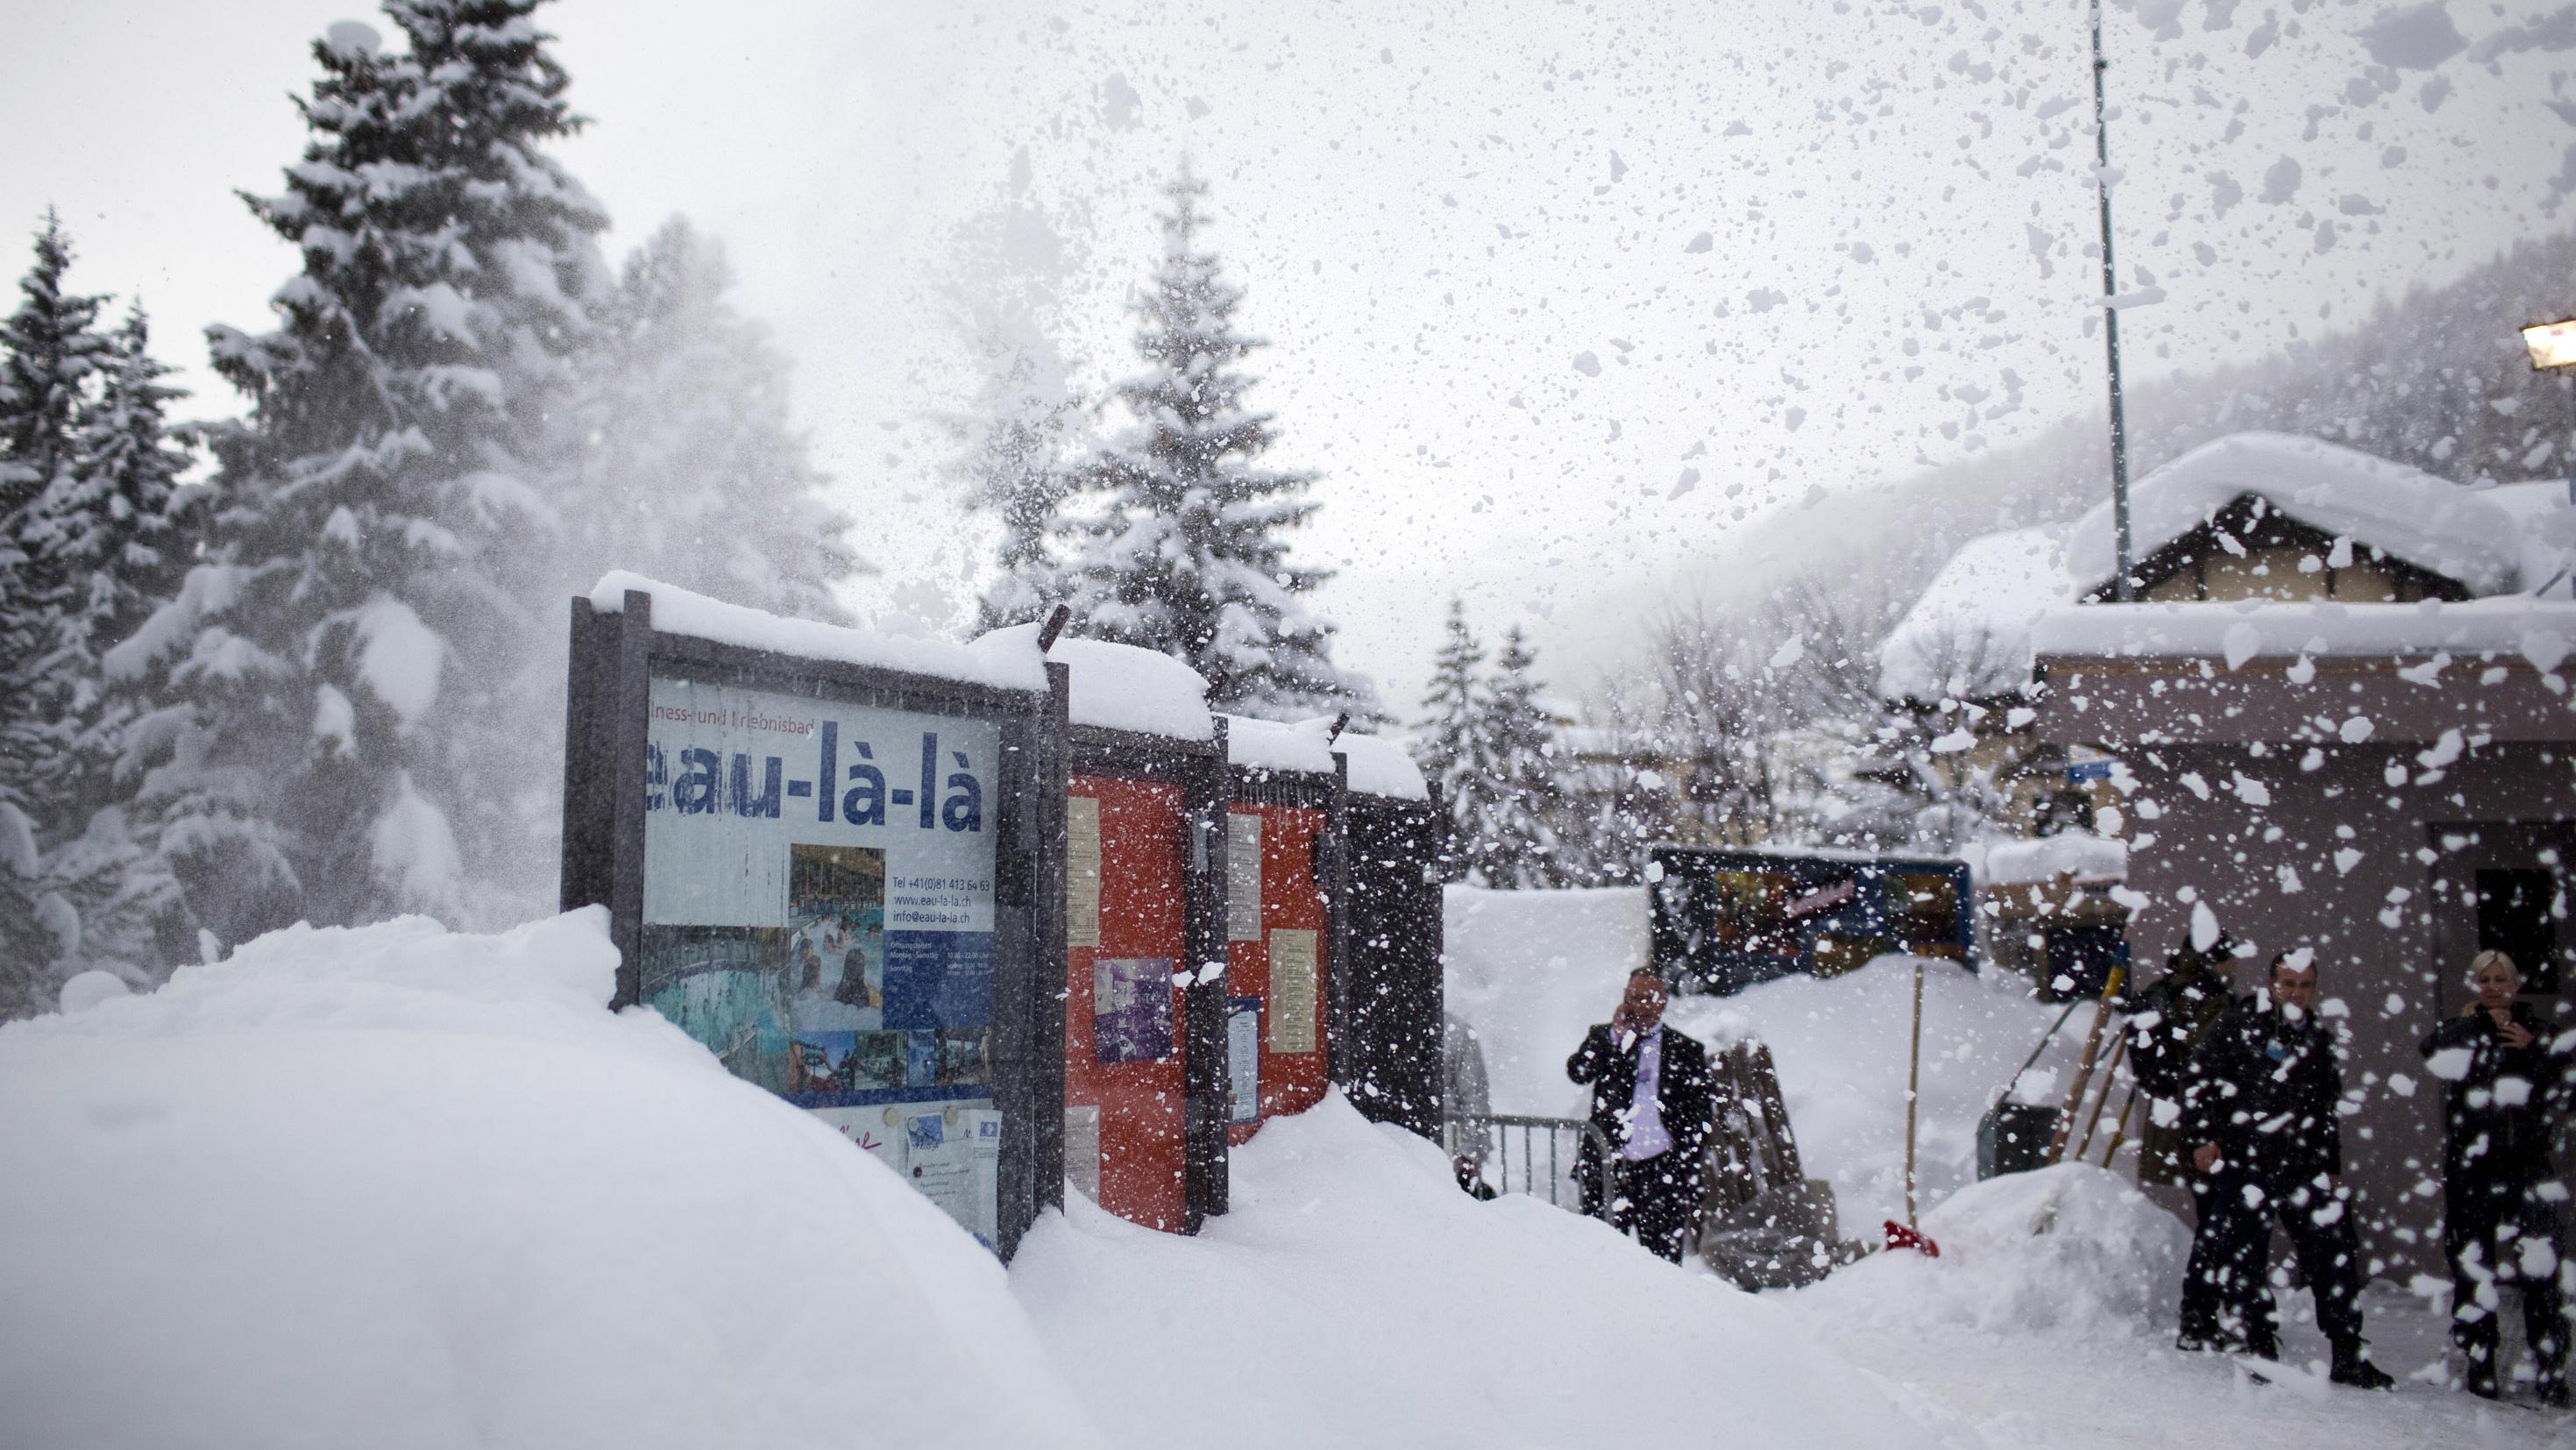 Snow in Davos, Switzerland